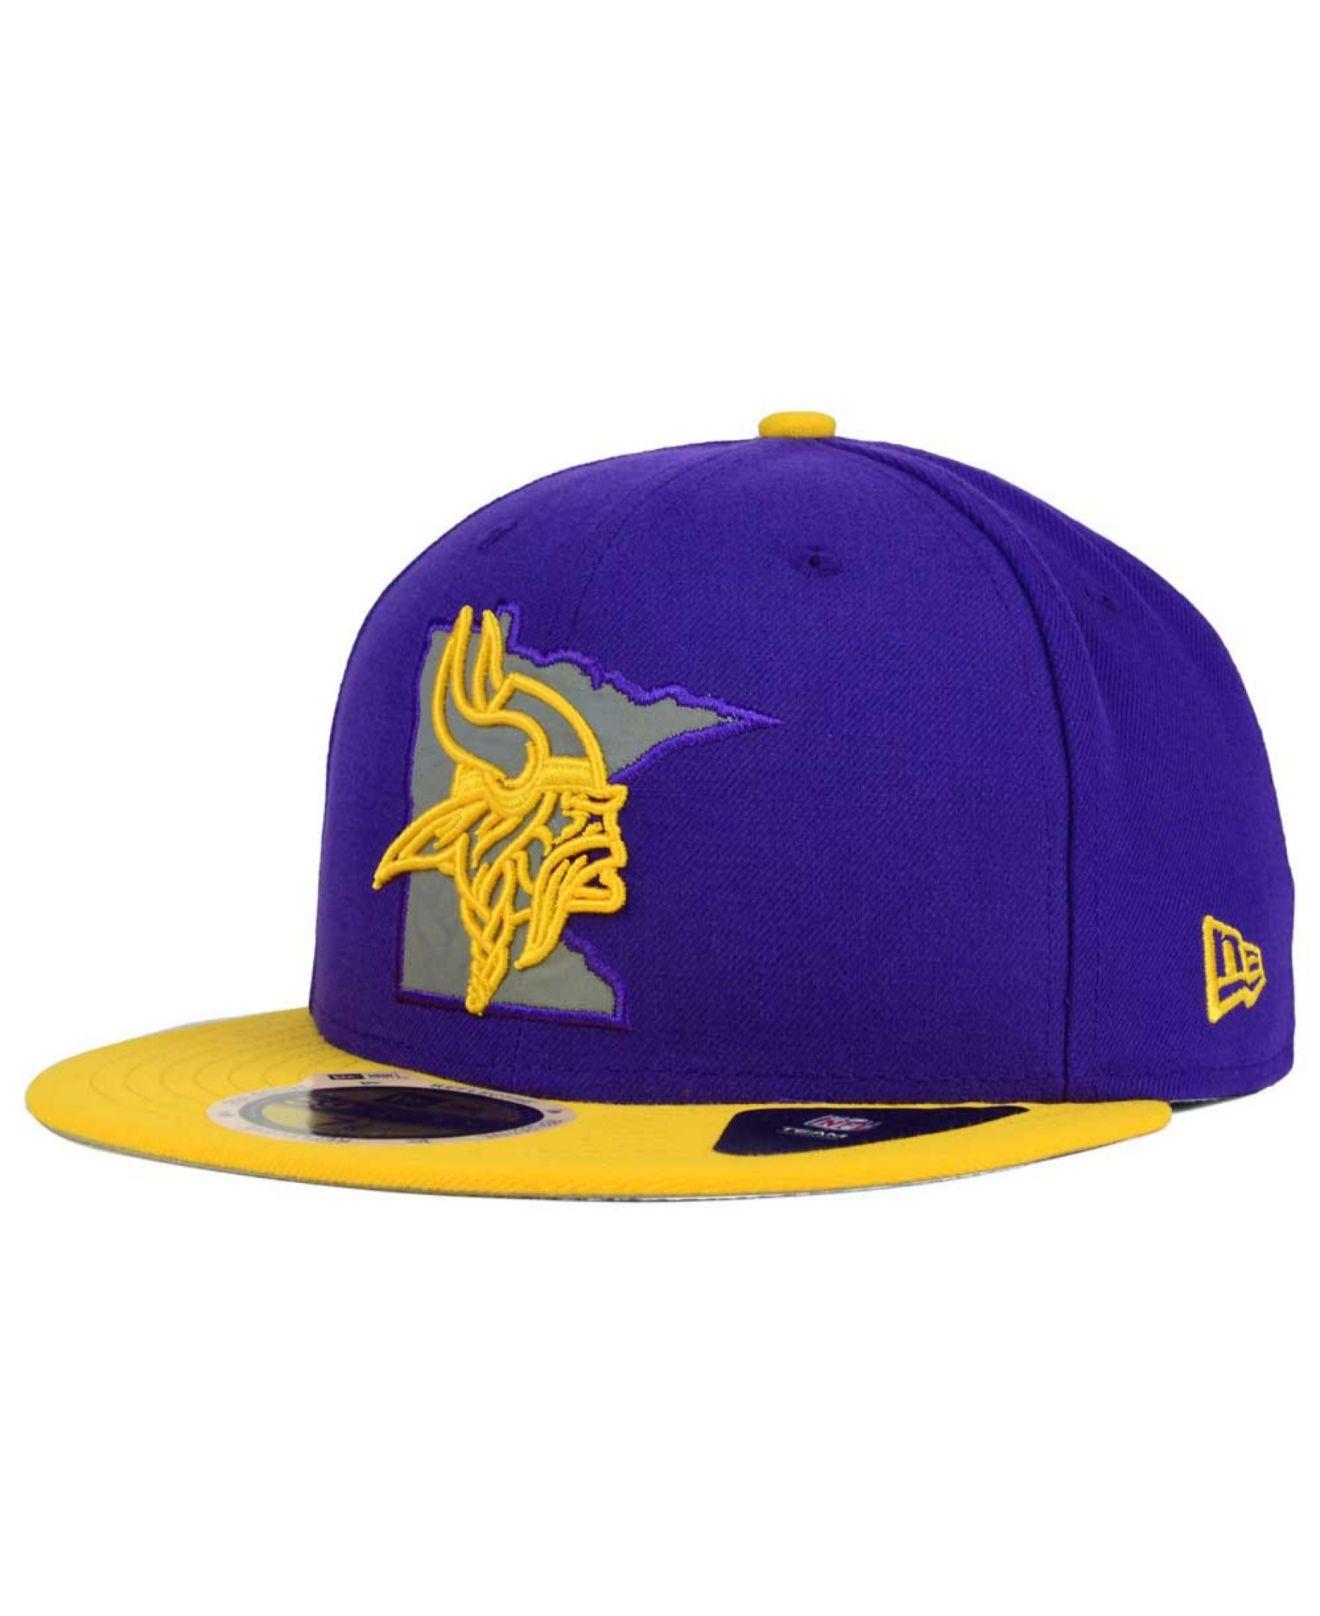 Lyst - KTZ Minnesota Vikings State Flective Redux 59fifty Cap in ... 8cc009d49